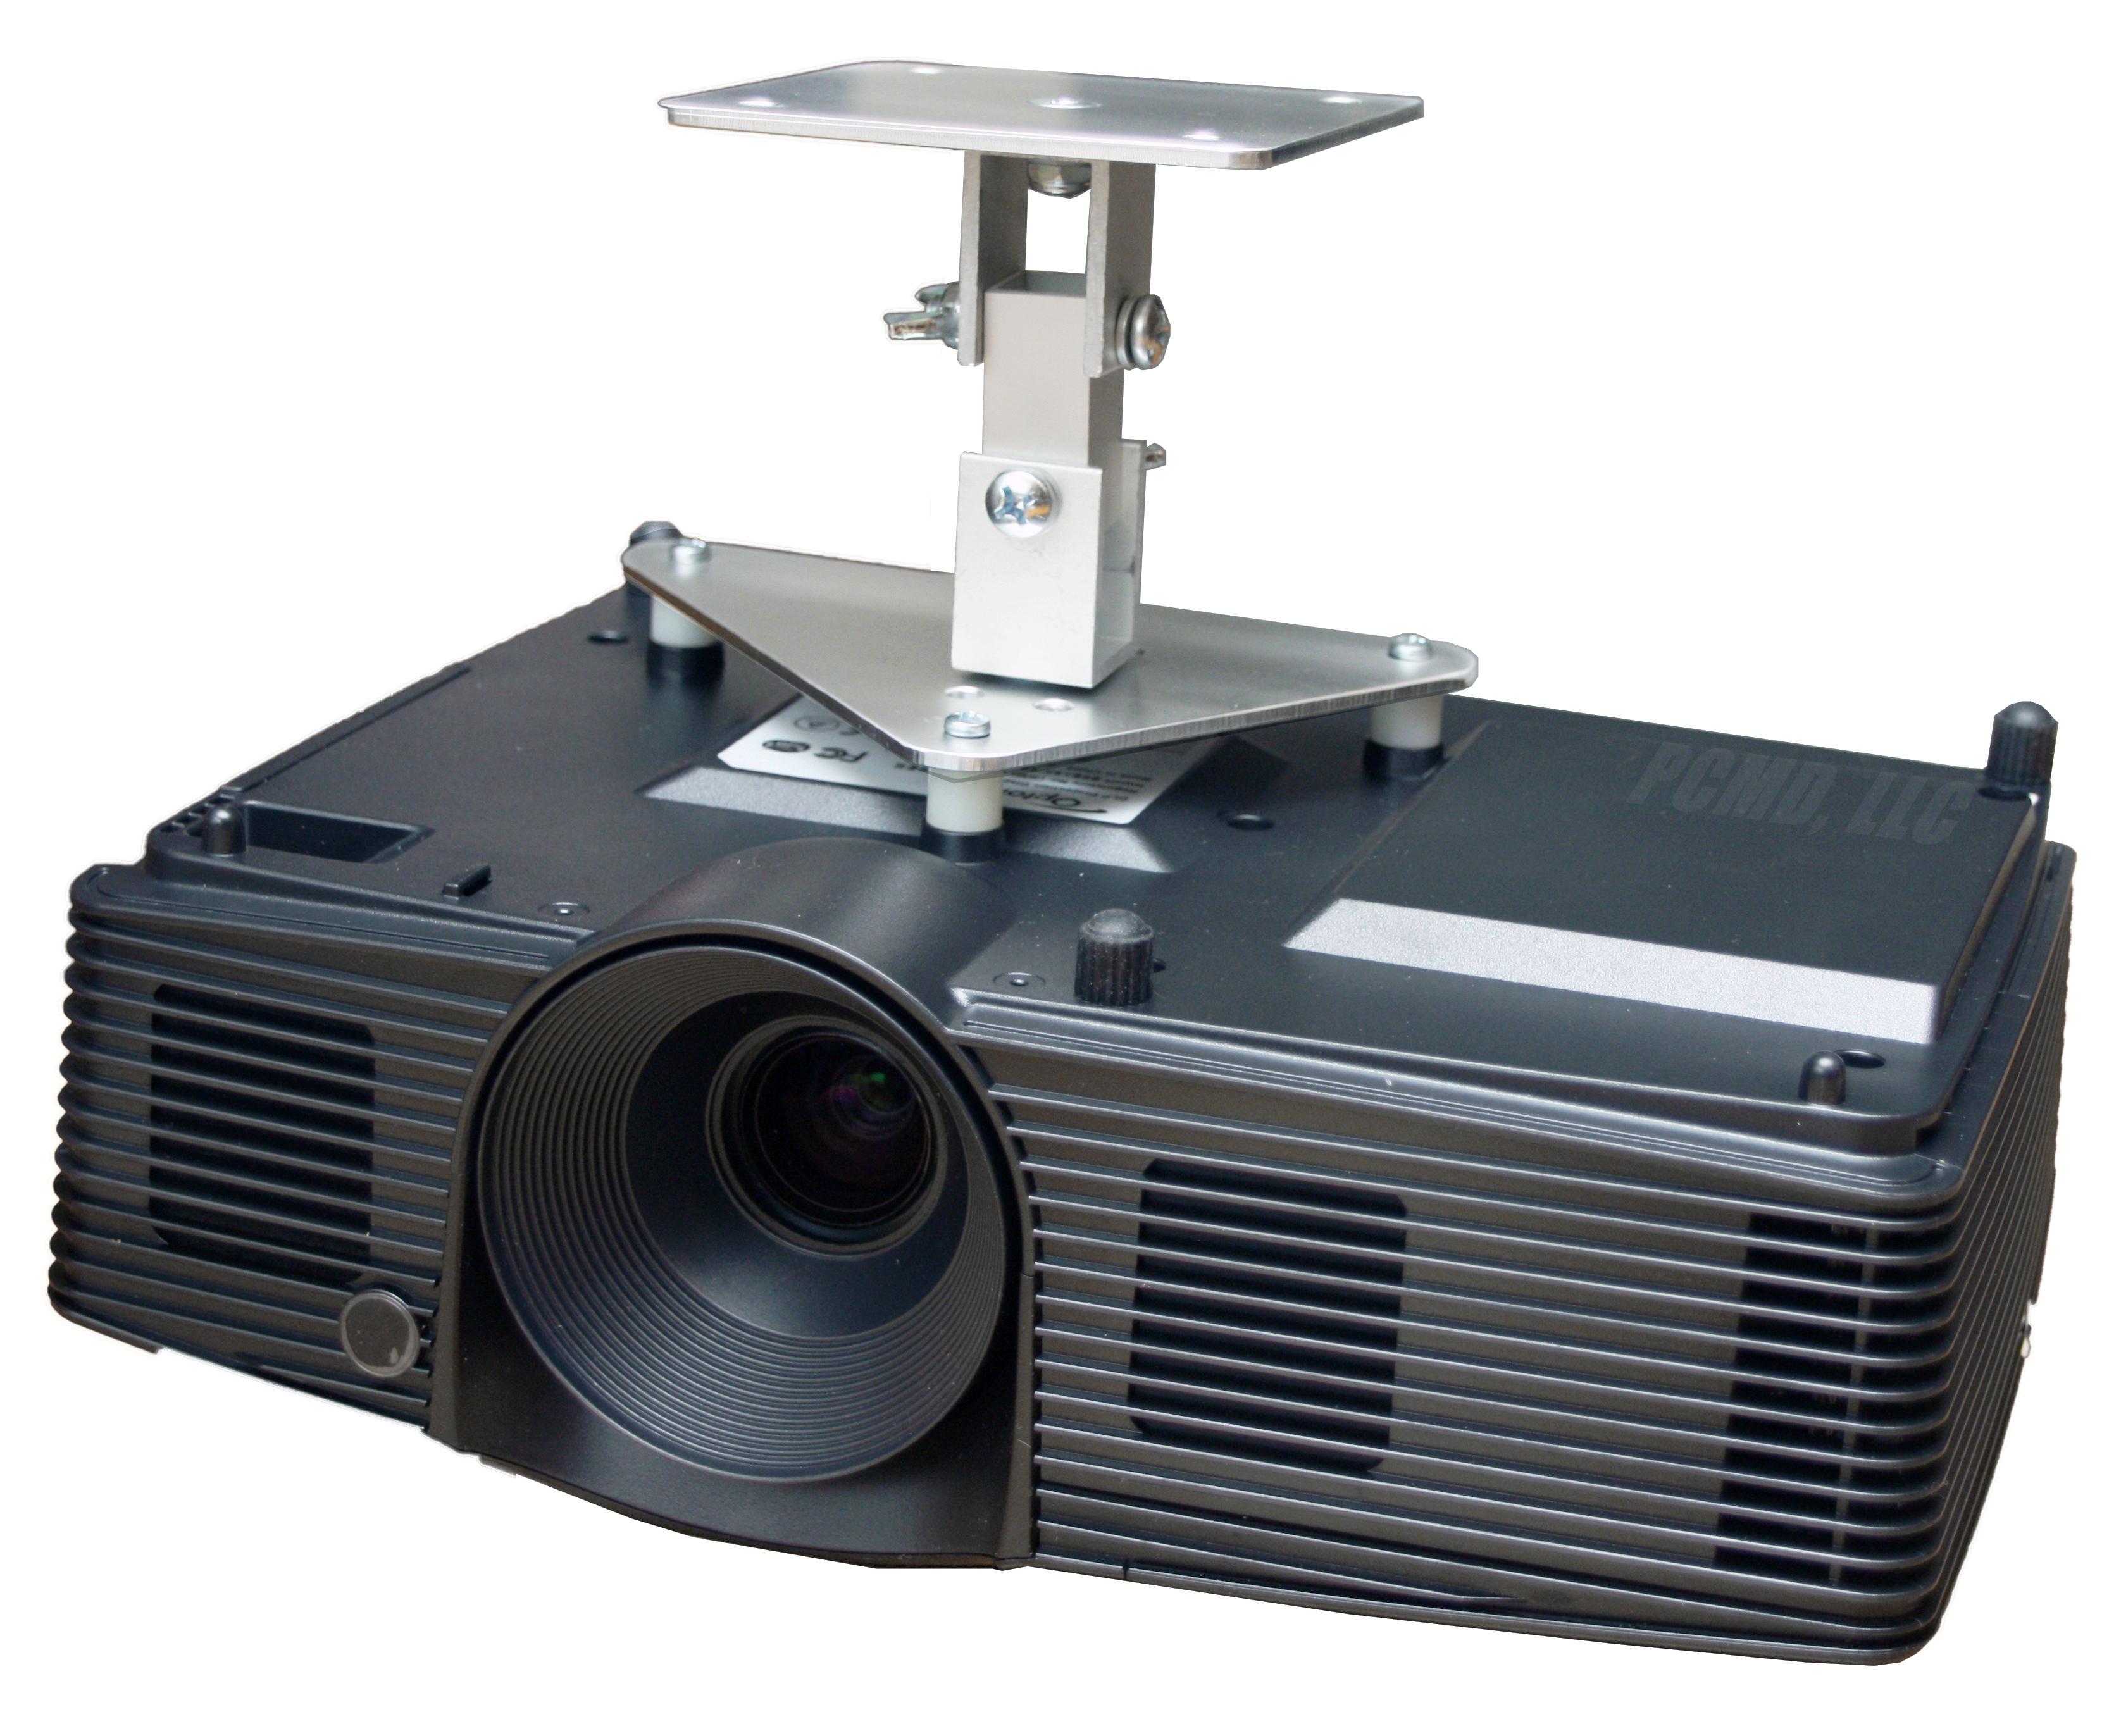 Projector-Gear Projector Ceiling Mount for EPSON PowerLite Home Cinema 5020UB 5020UBe 5025UB